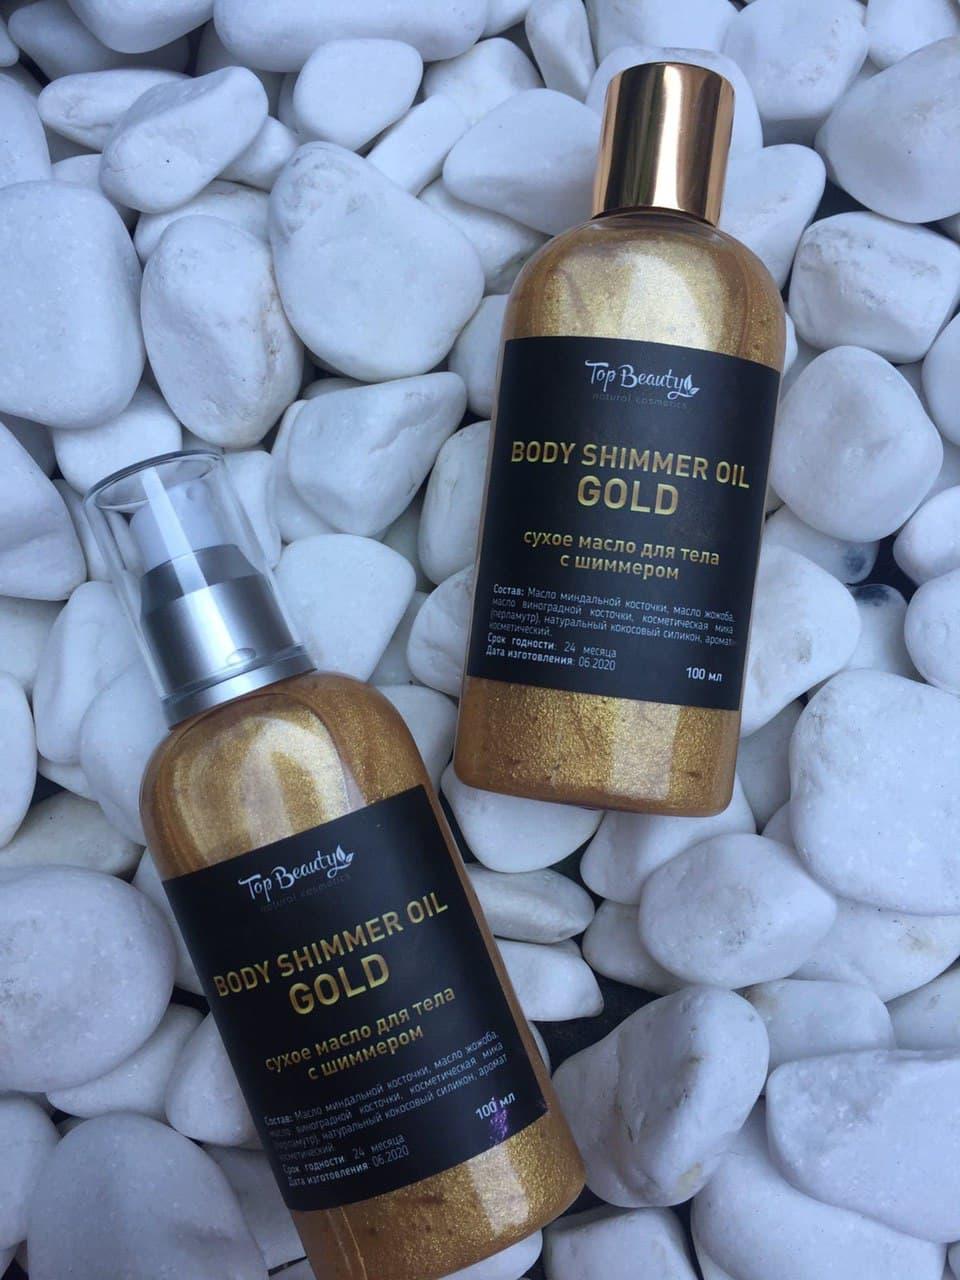 Сухое масло для тела с шиммером золото Top Beauty Body Shimmer oil Gold